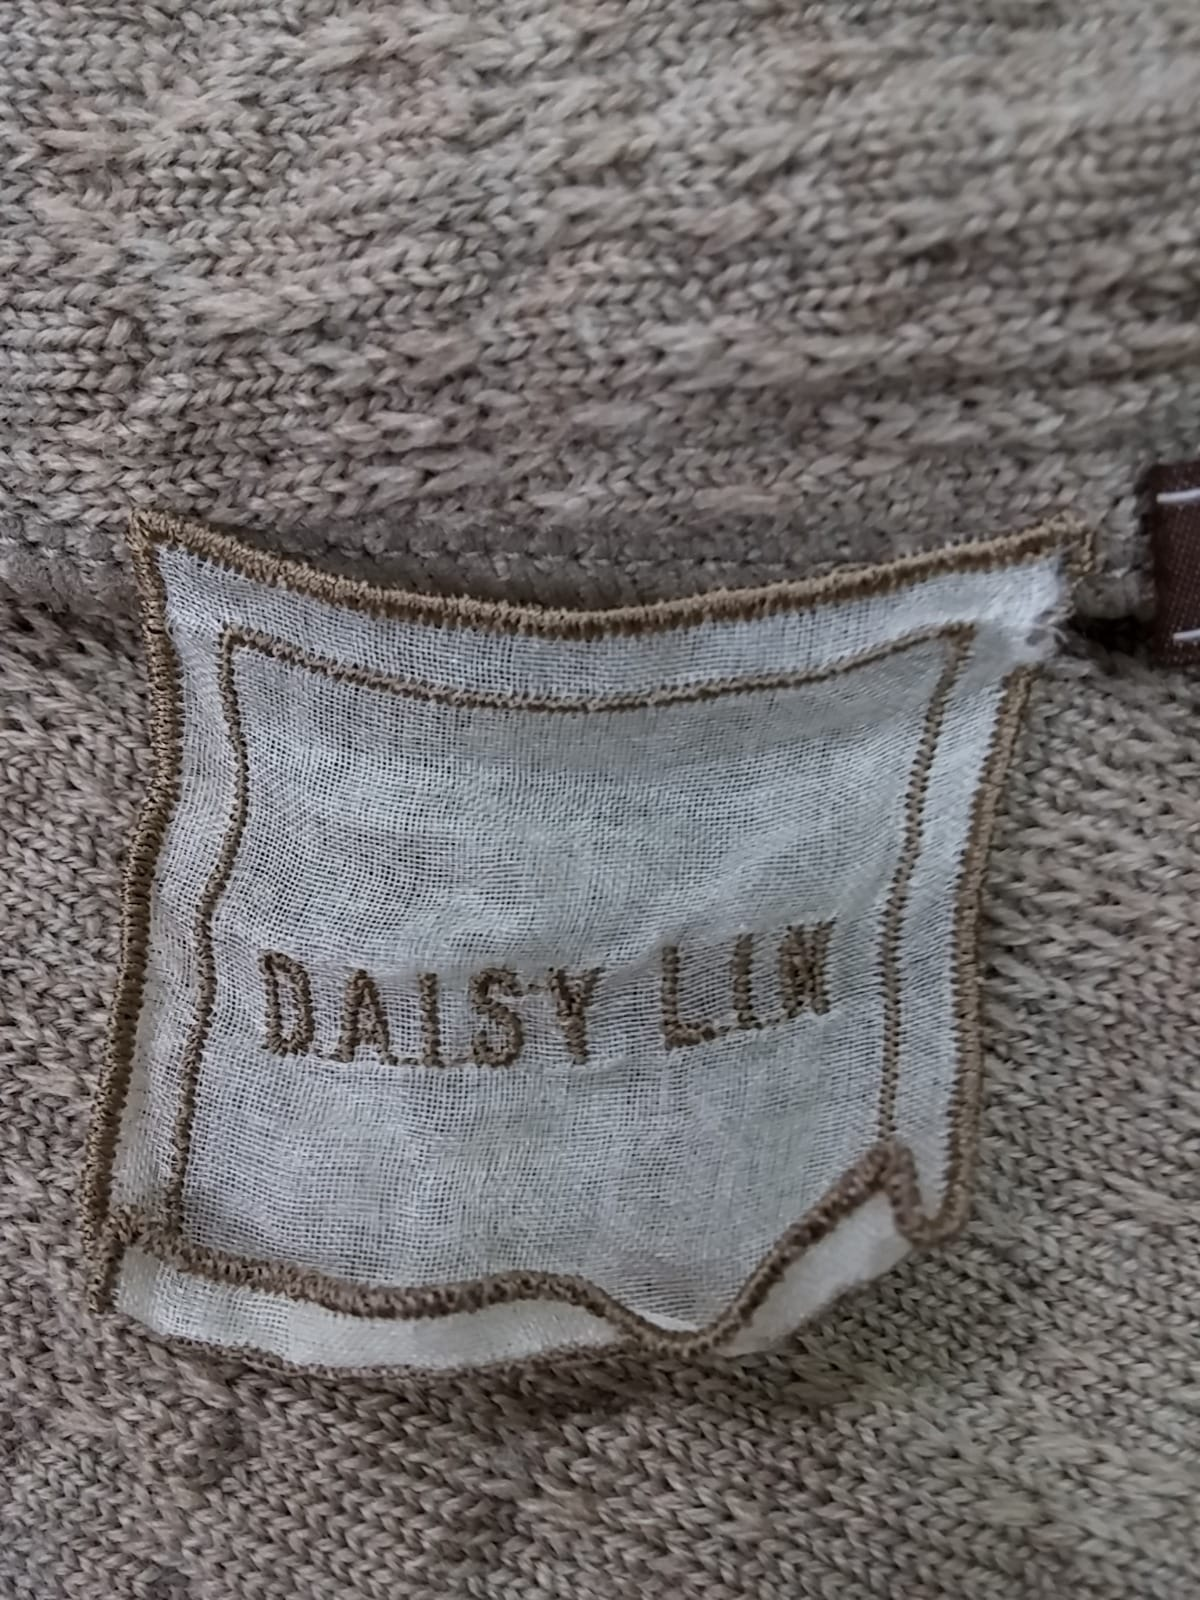 DAISY LIN(デイジーリン)のカーディガン